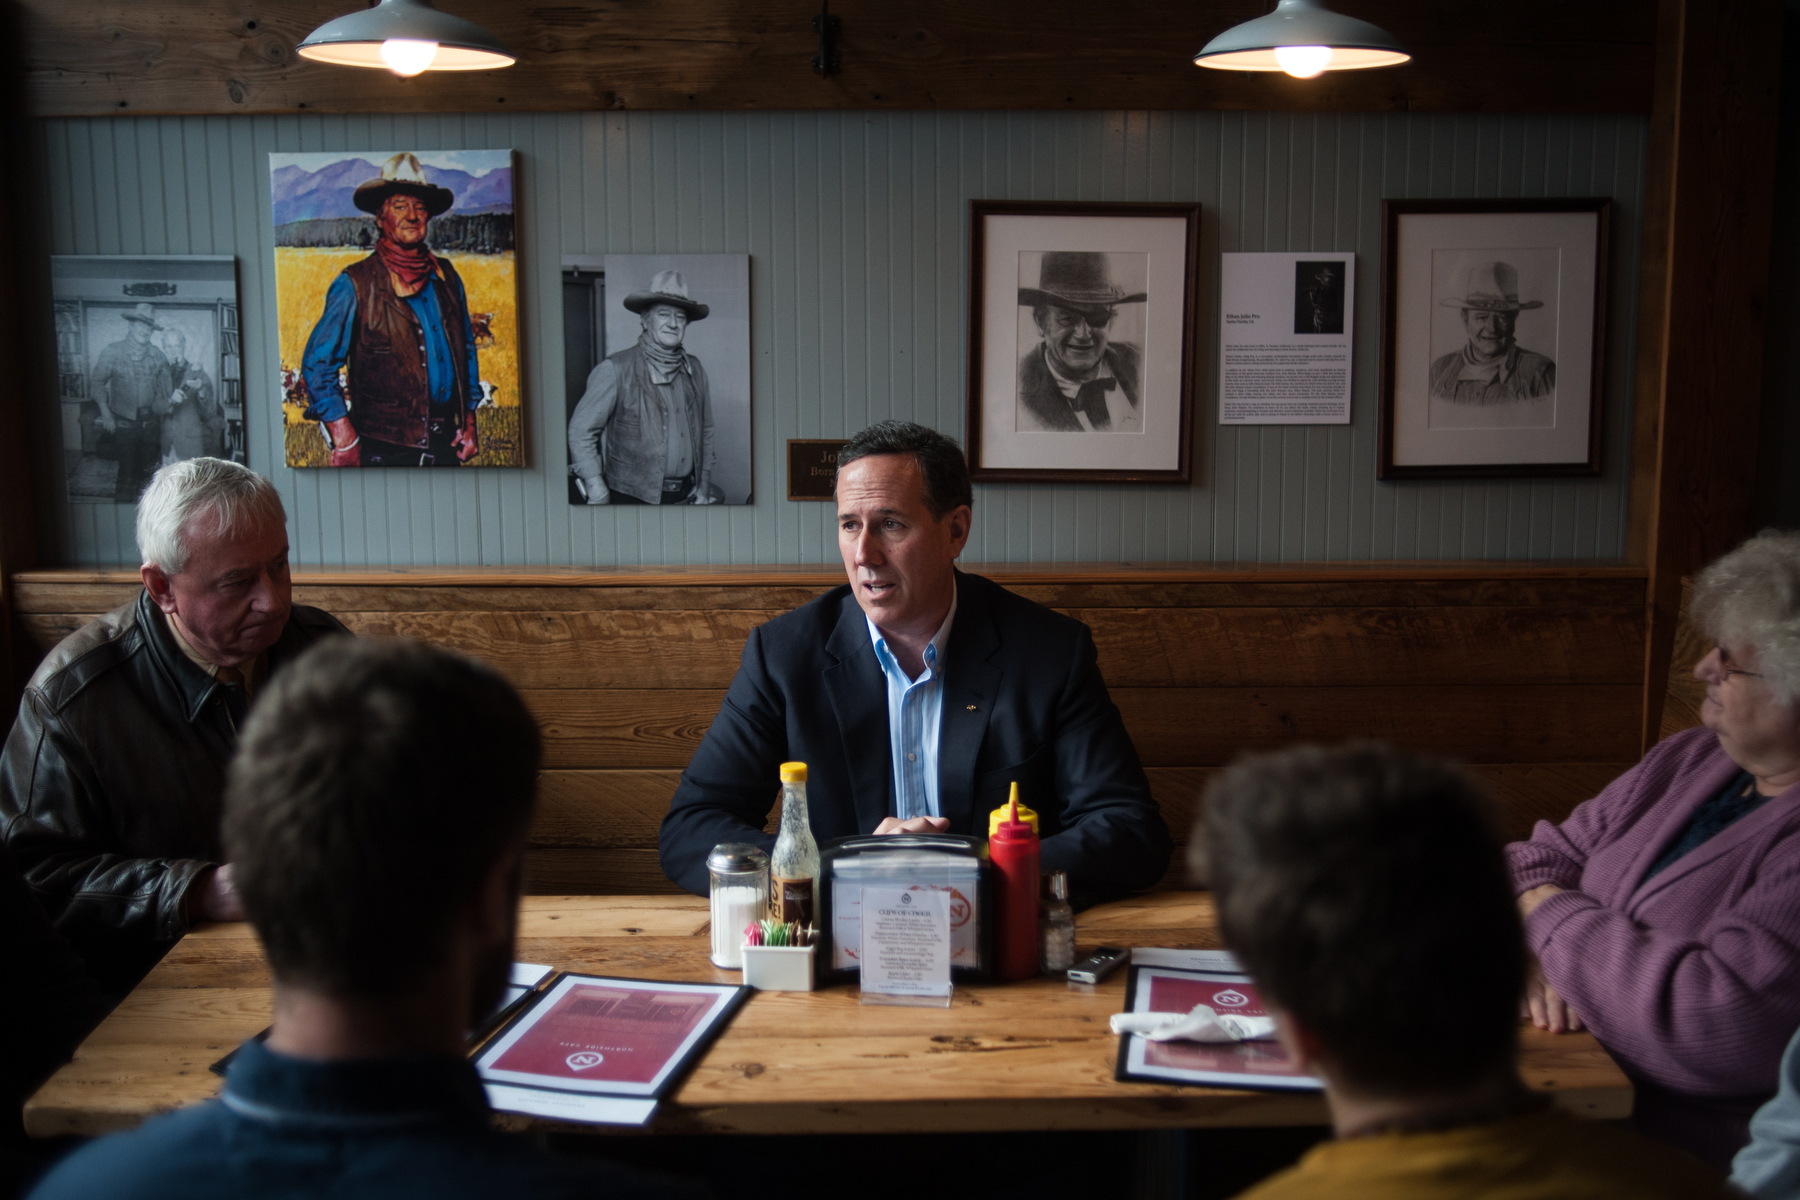 U.S. Republican presidential candidate Rick Santorum meets with supporters at Northside Diner in Winterset, Iowa December 8, 2015.